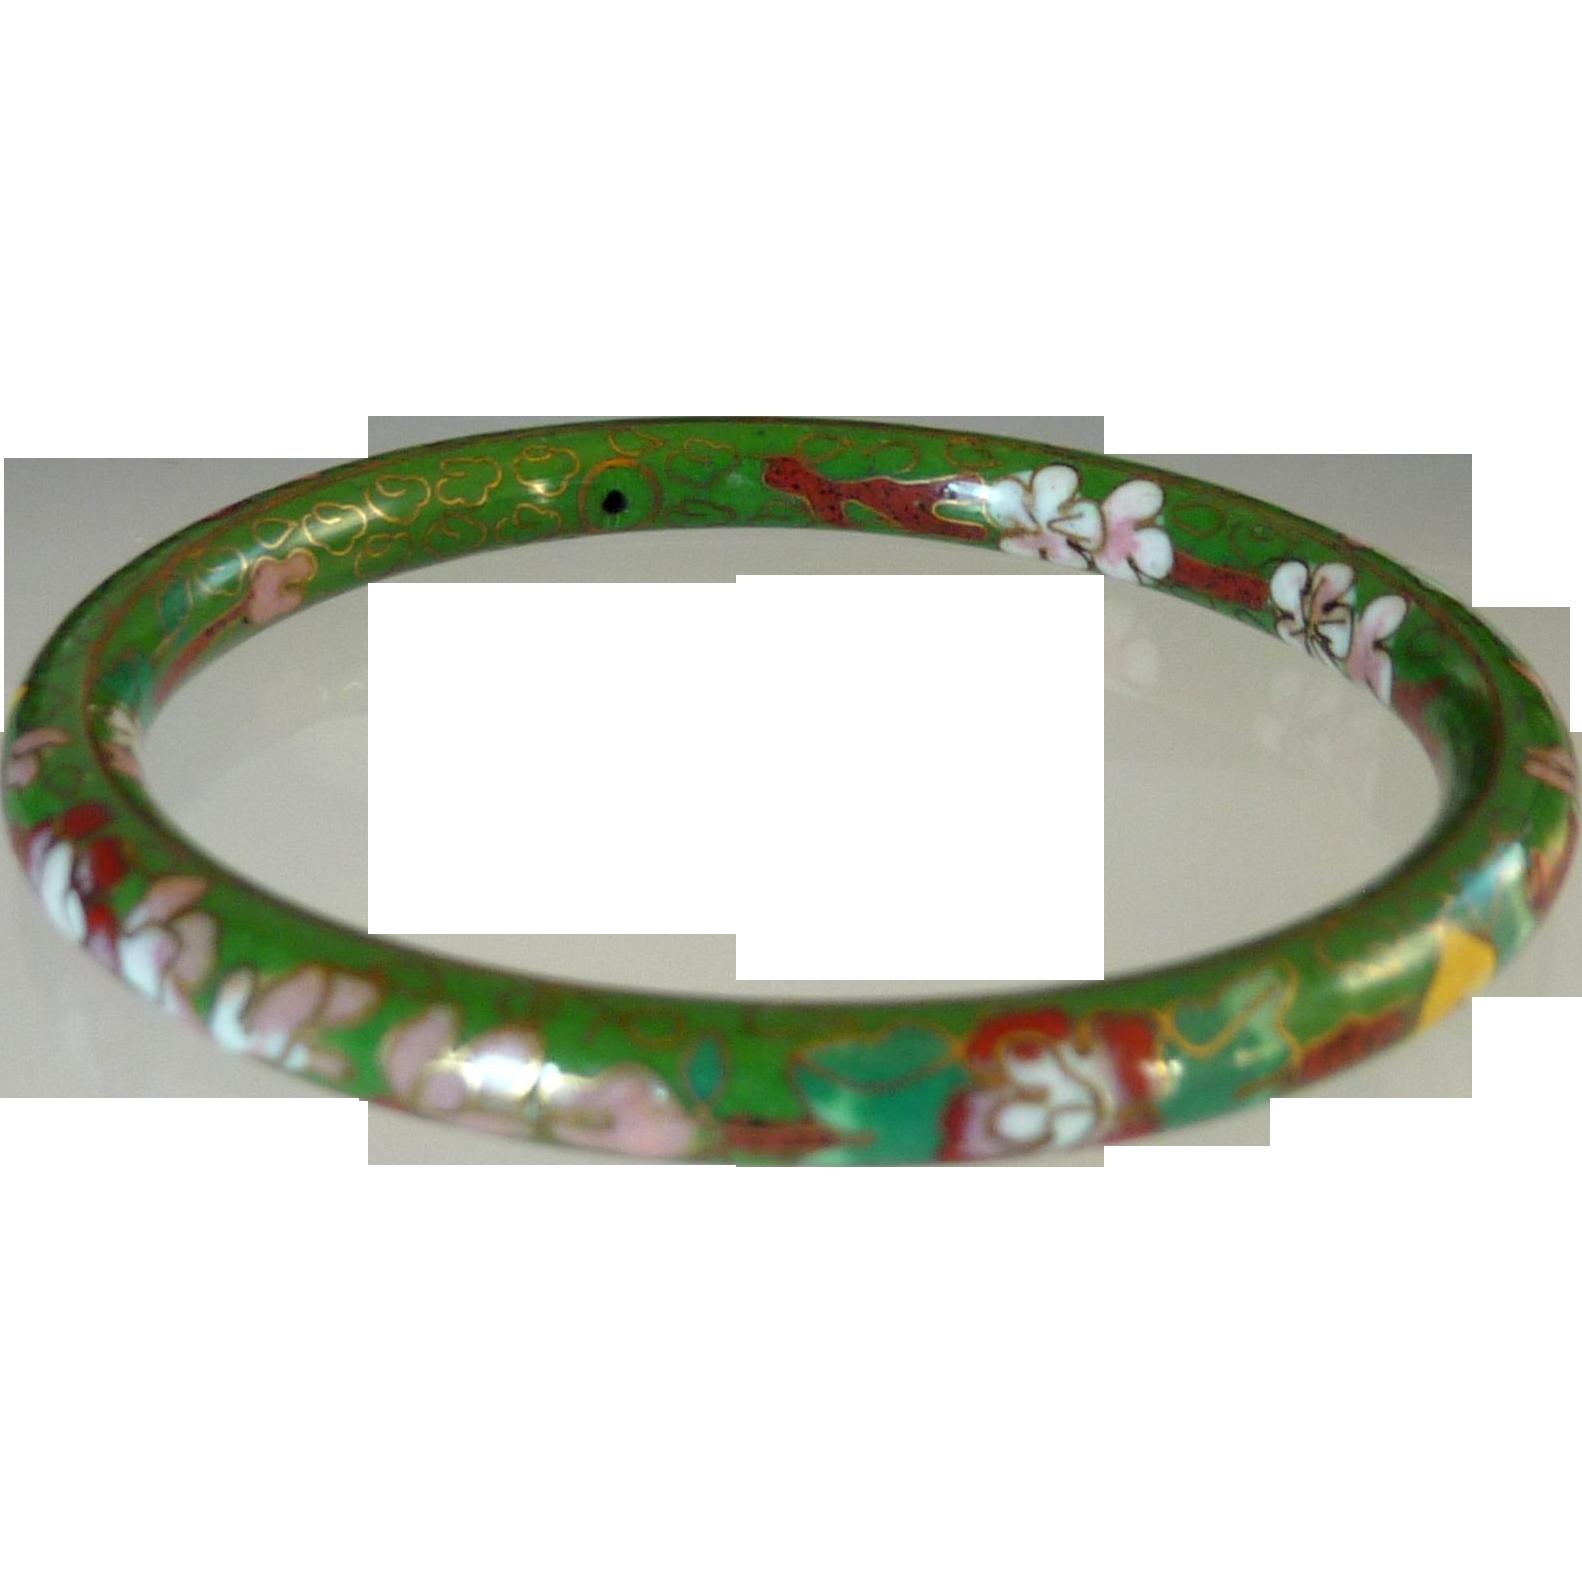 Green Floral Enamel Cloisonné Bangle Bracelet